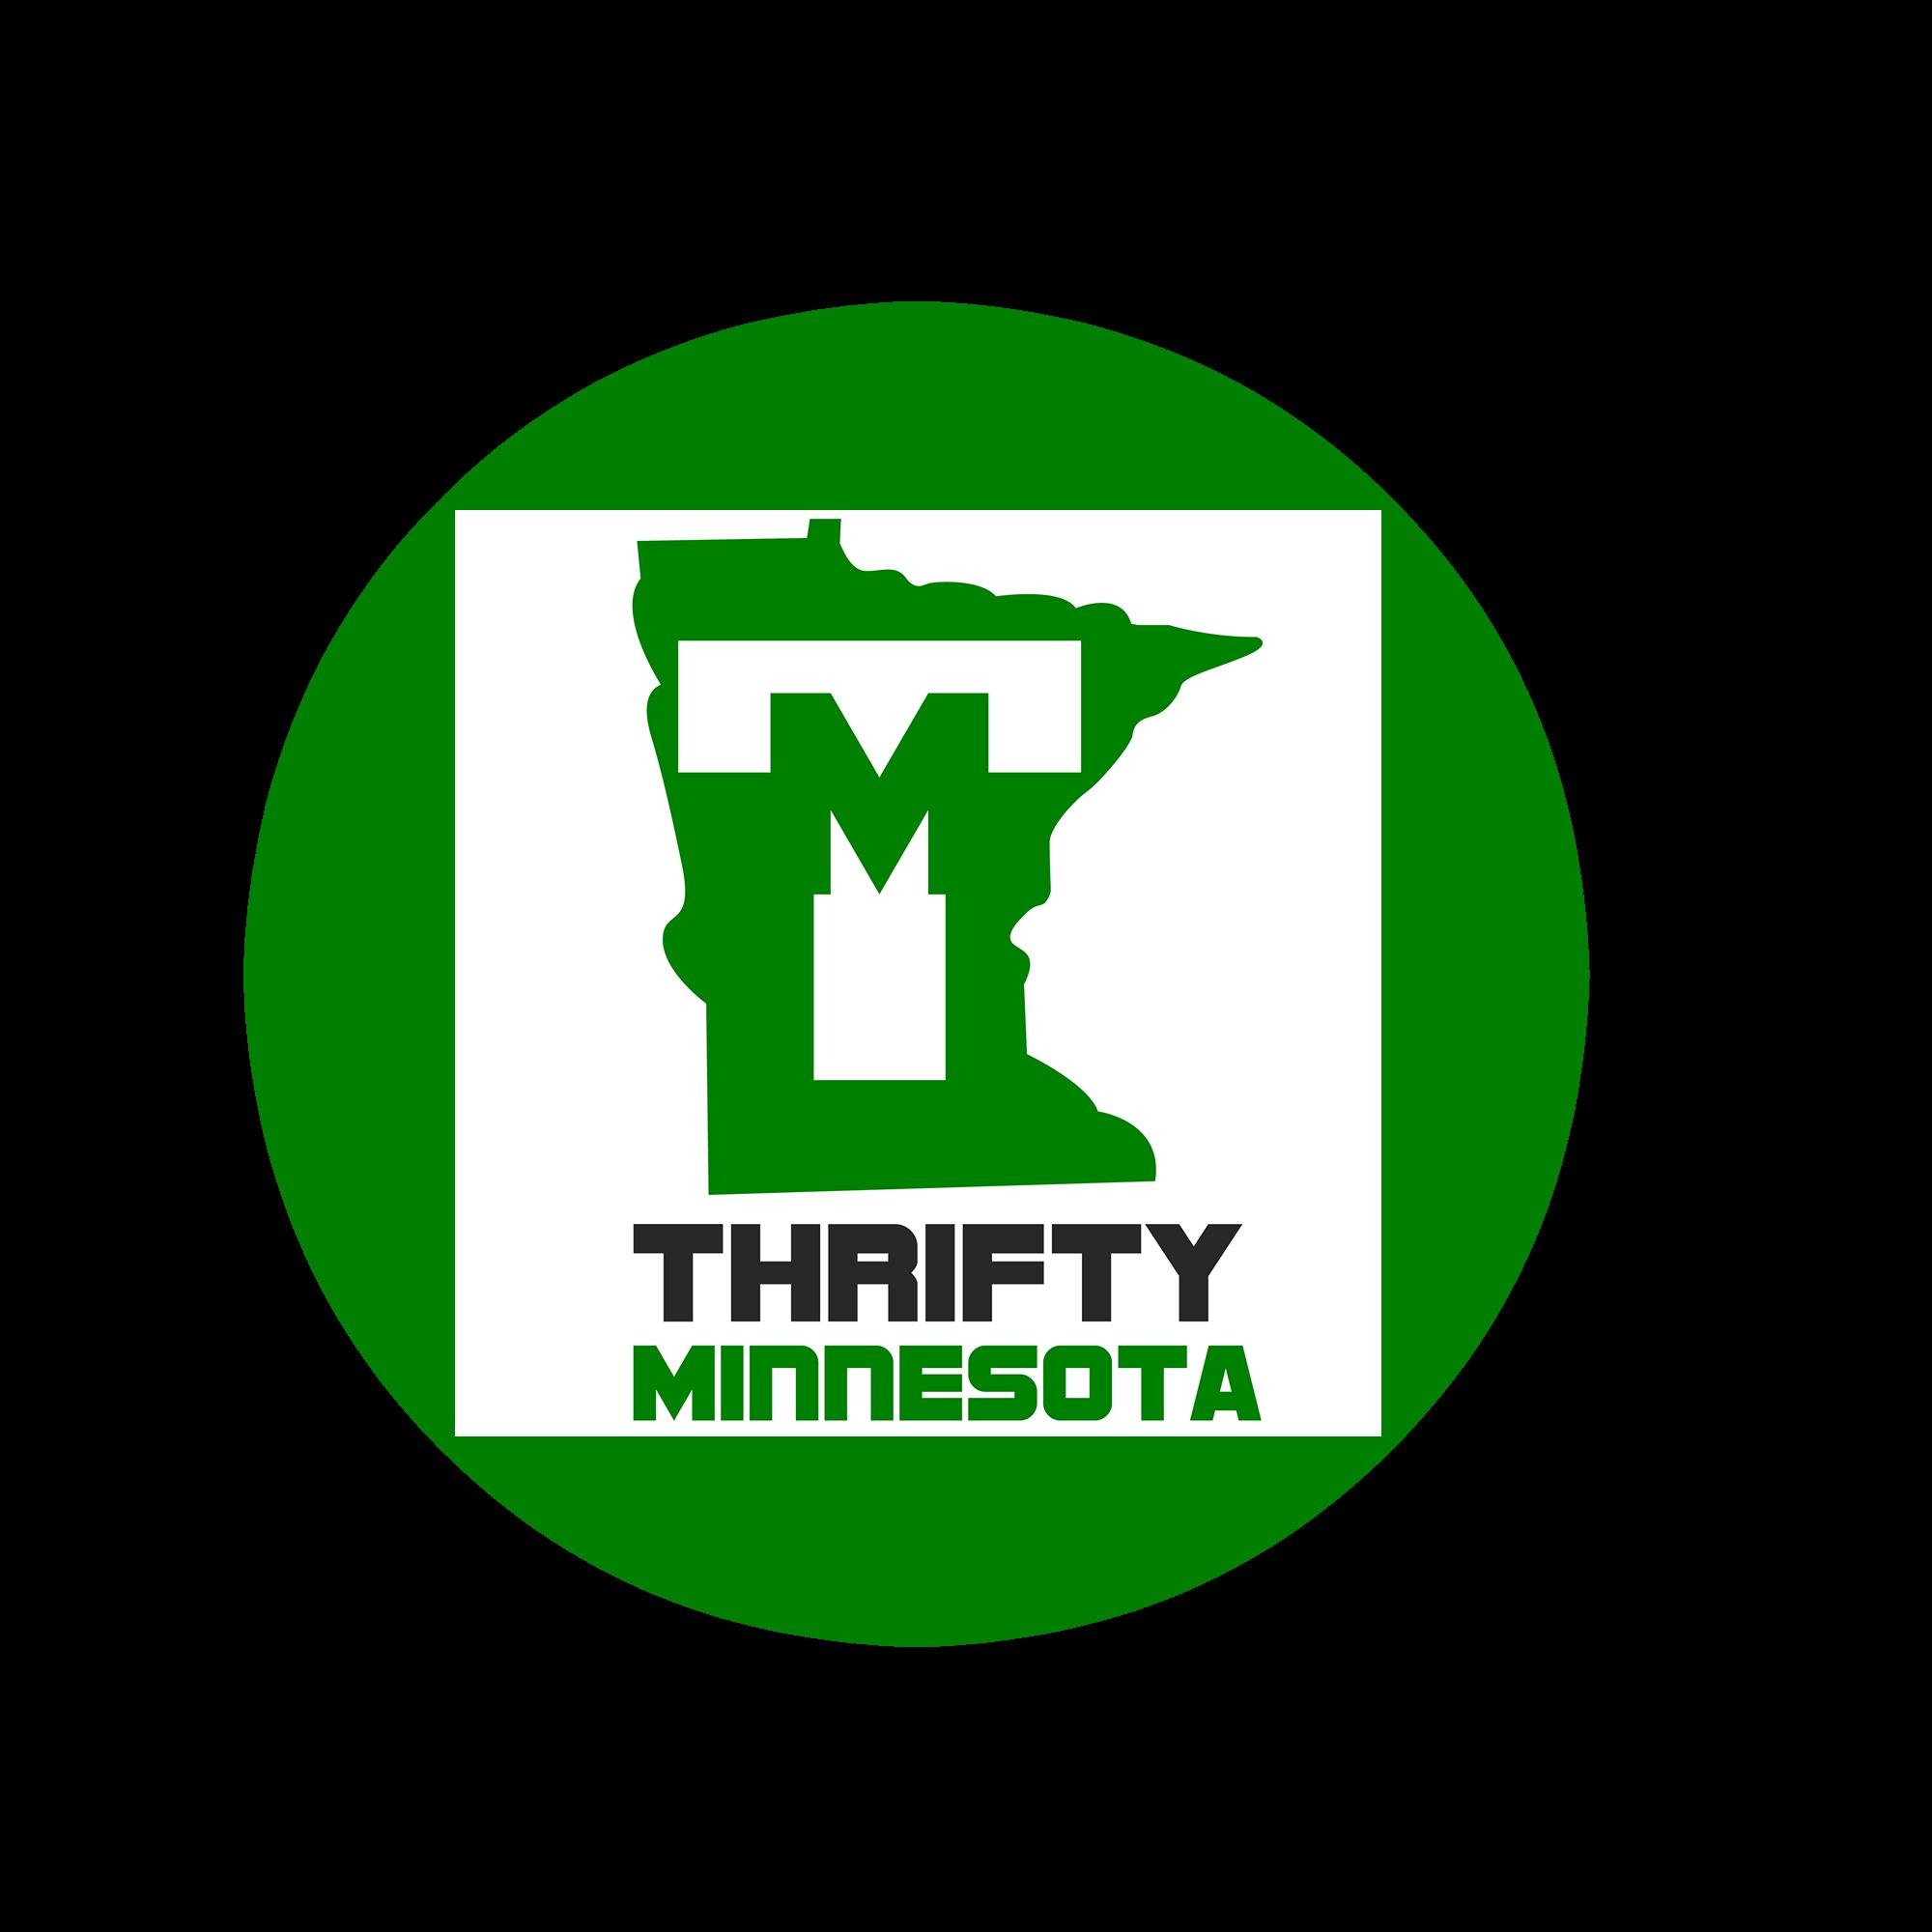 2018 Minnesota City Wide Garage Sales List - Thrifty Minnesota